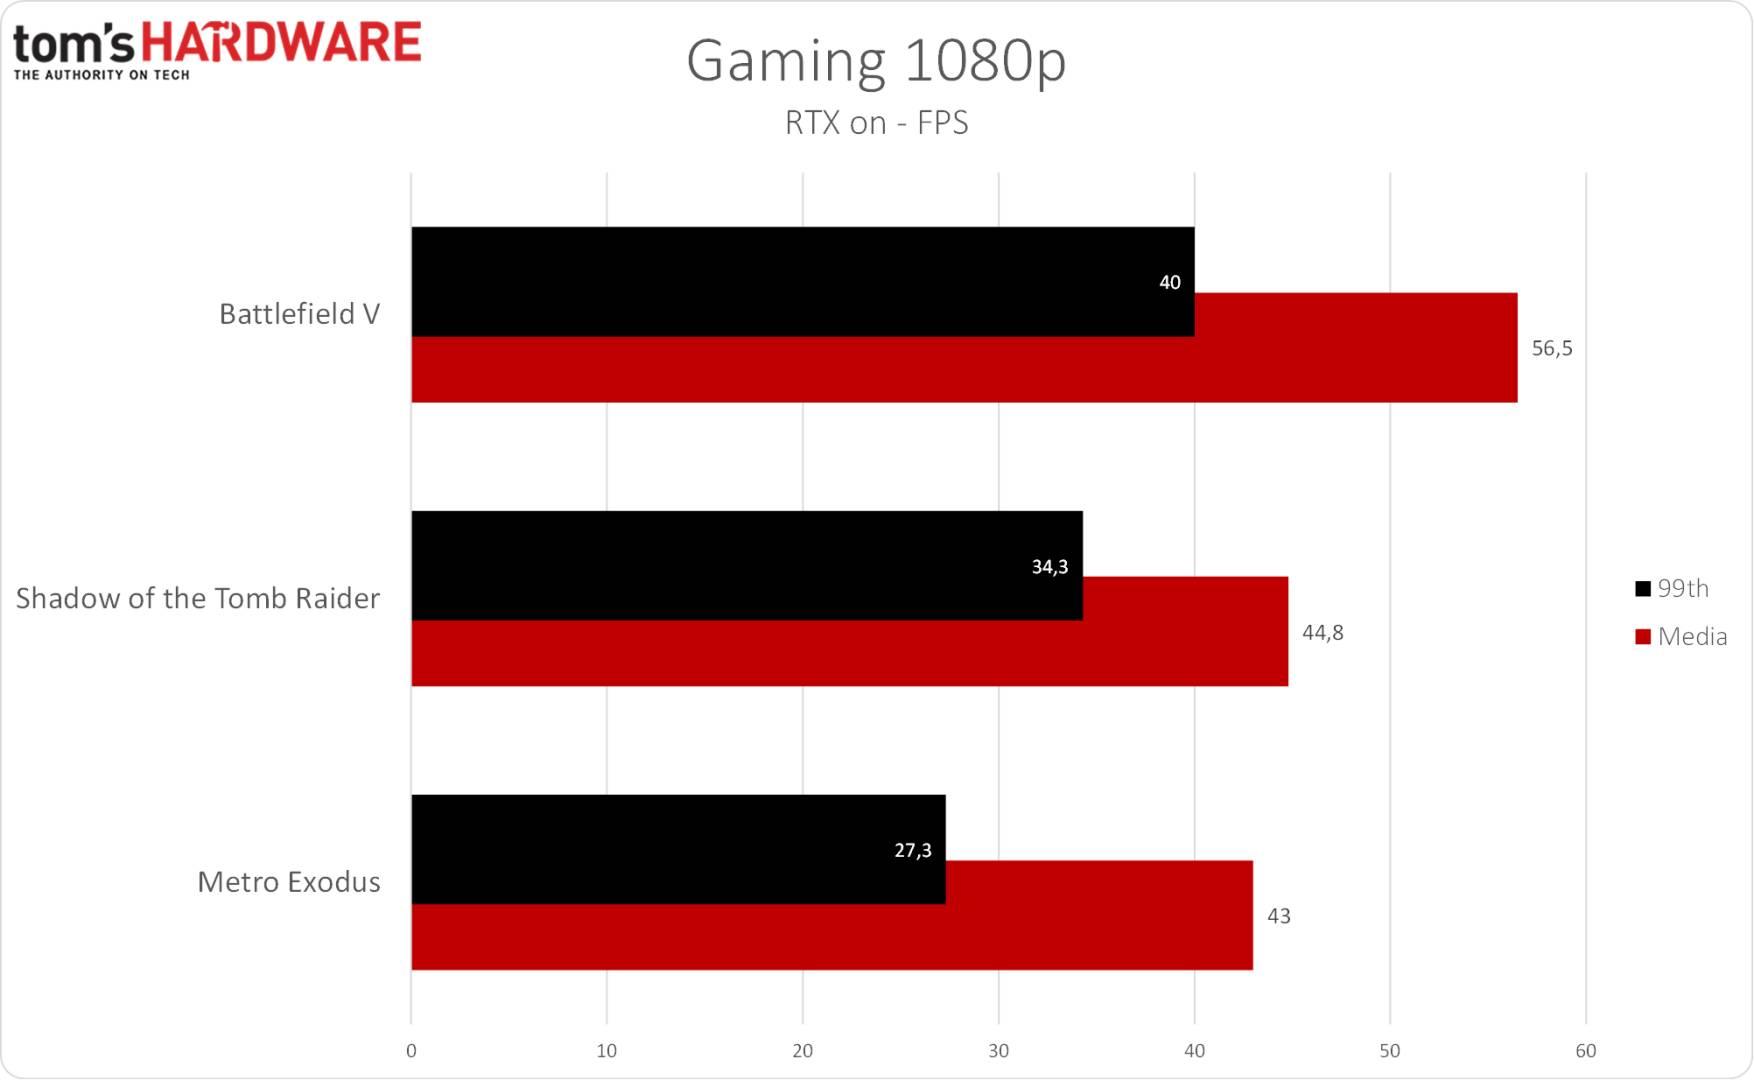 Eurocom Nightsky RX15 - Gaming 1080p RTX